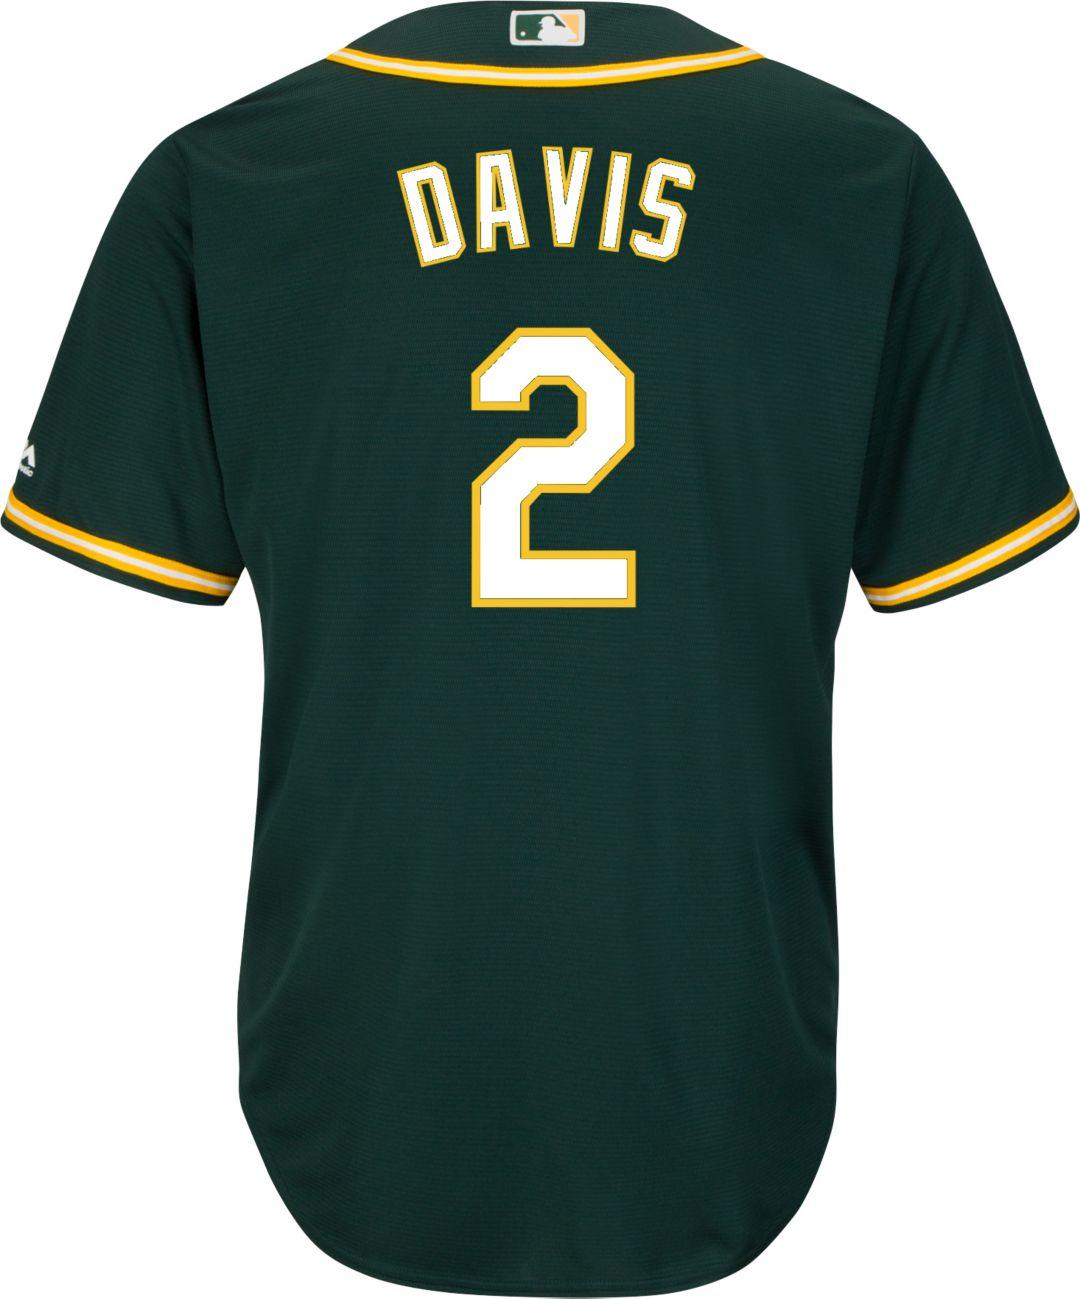 6fdfad9a Majestic Youth Replica Oakland Athletics Khris Davis #2 Cool Base ...